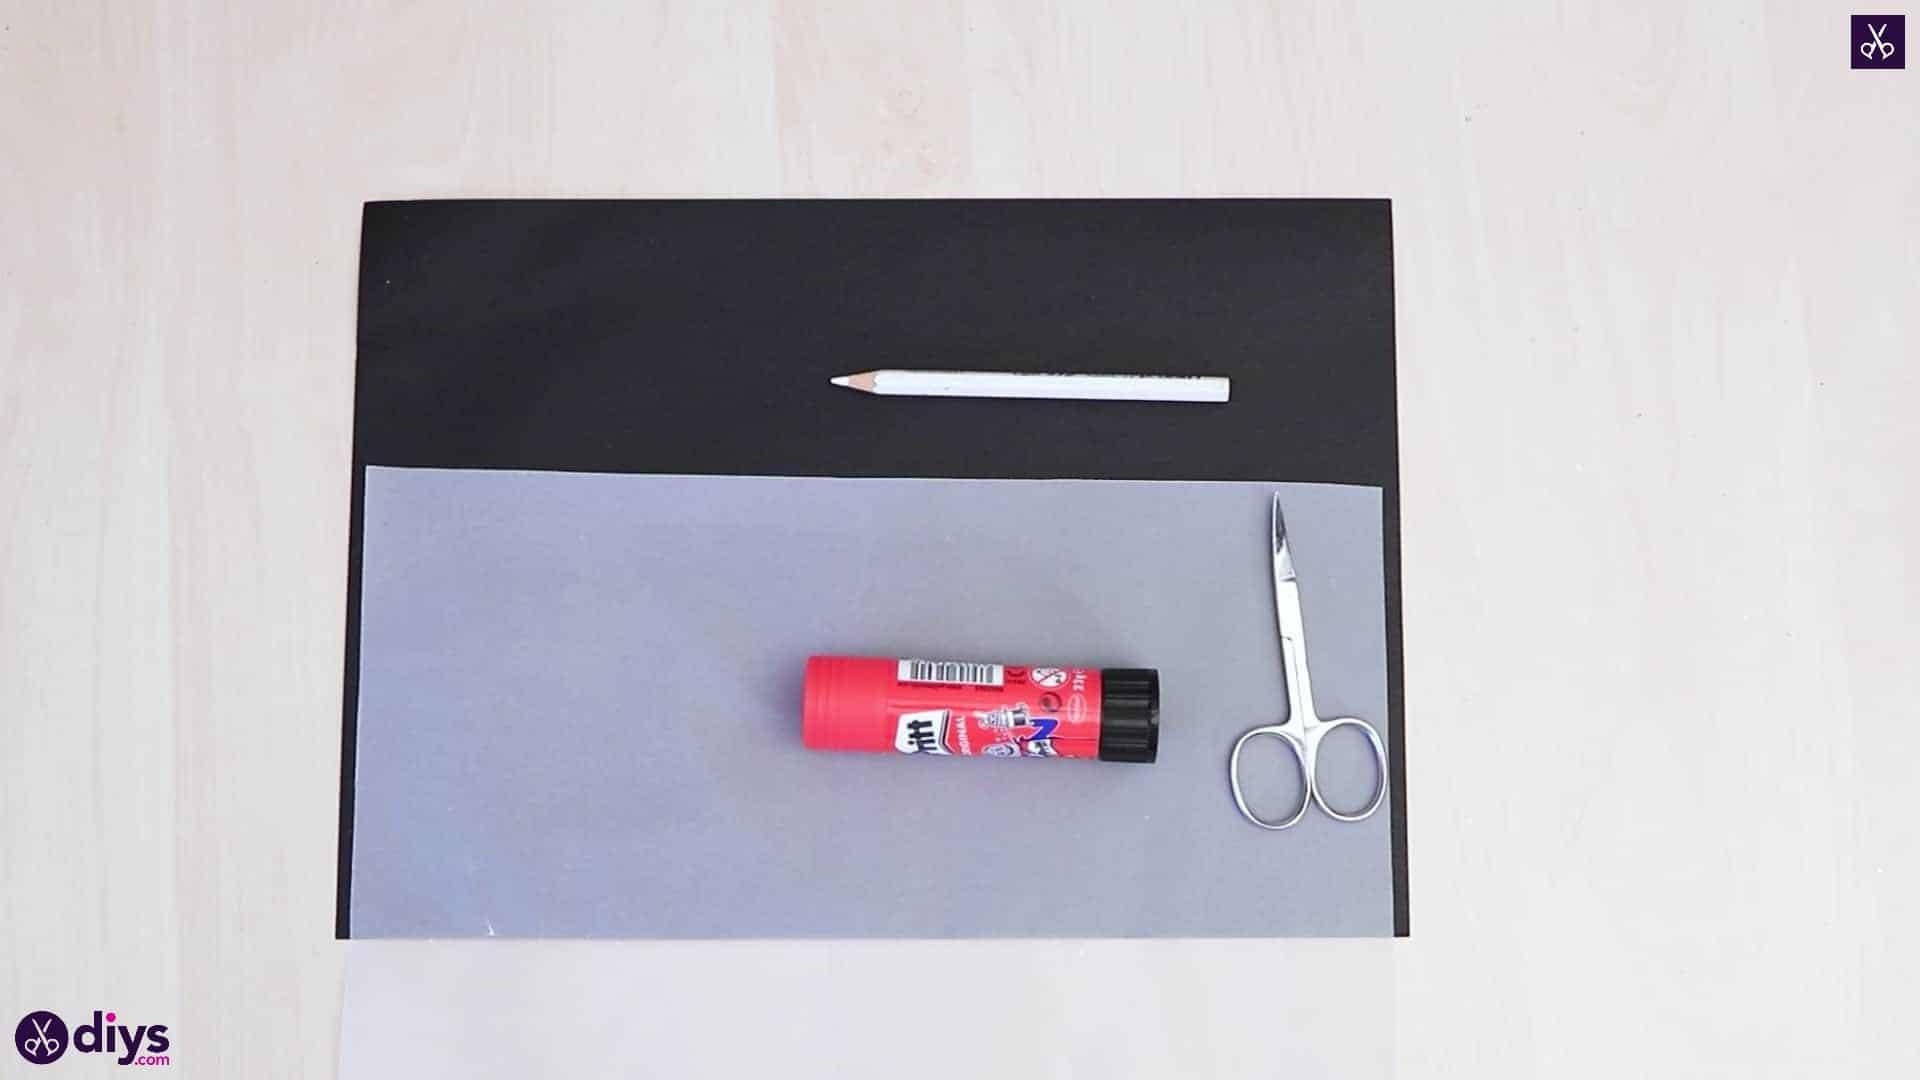 Diy paper lantern art materials